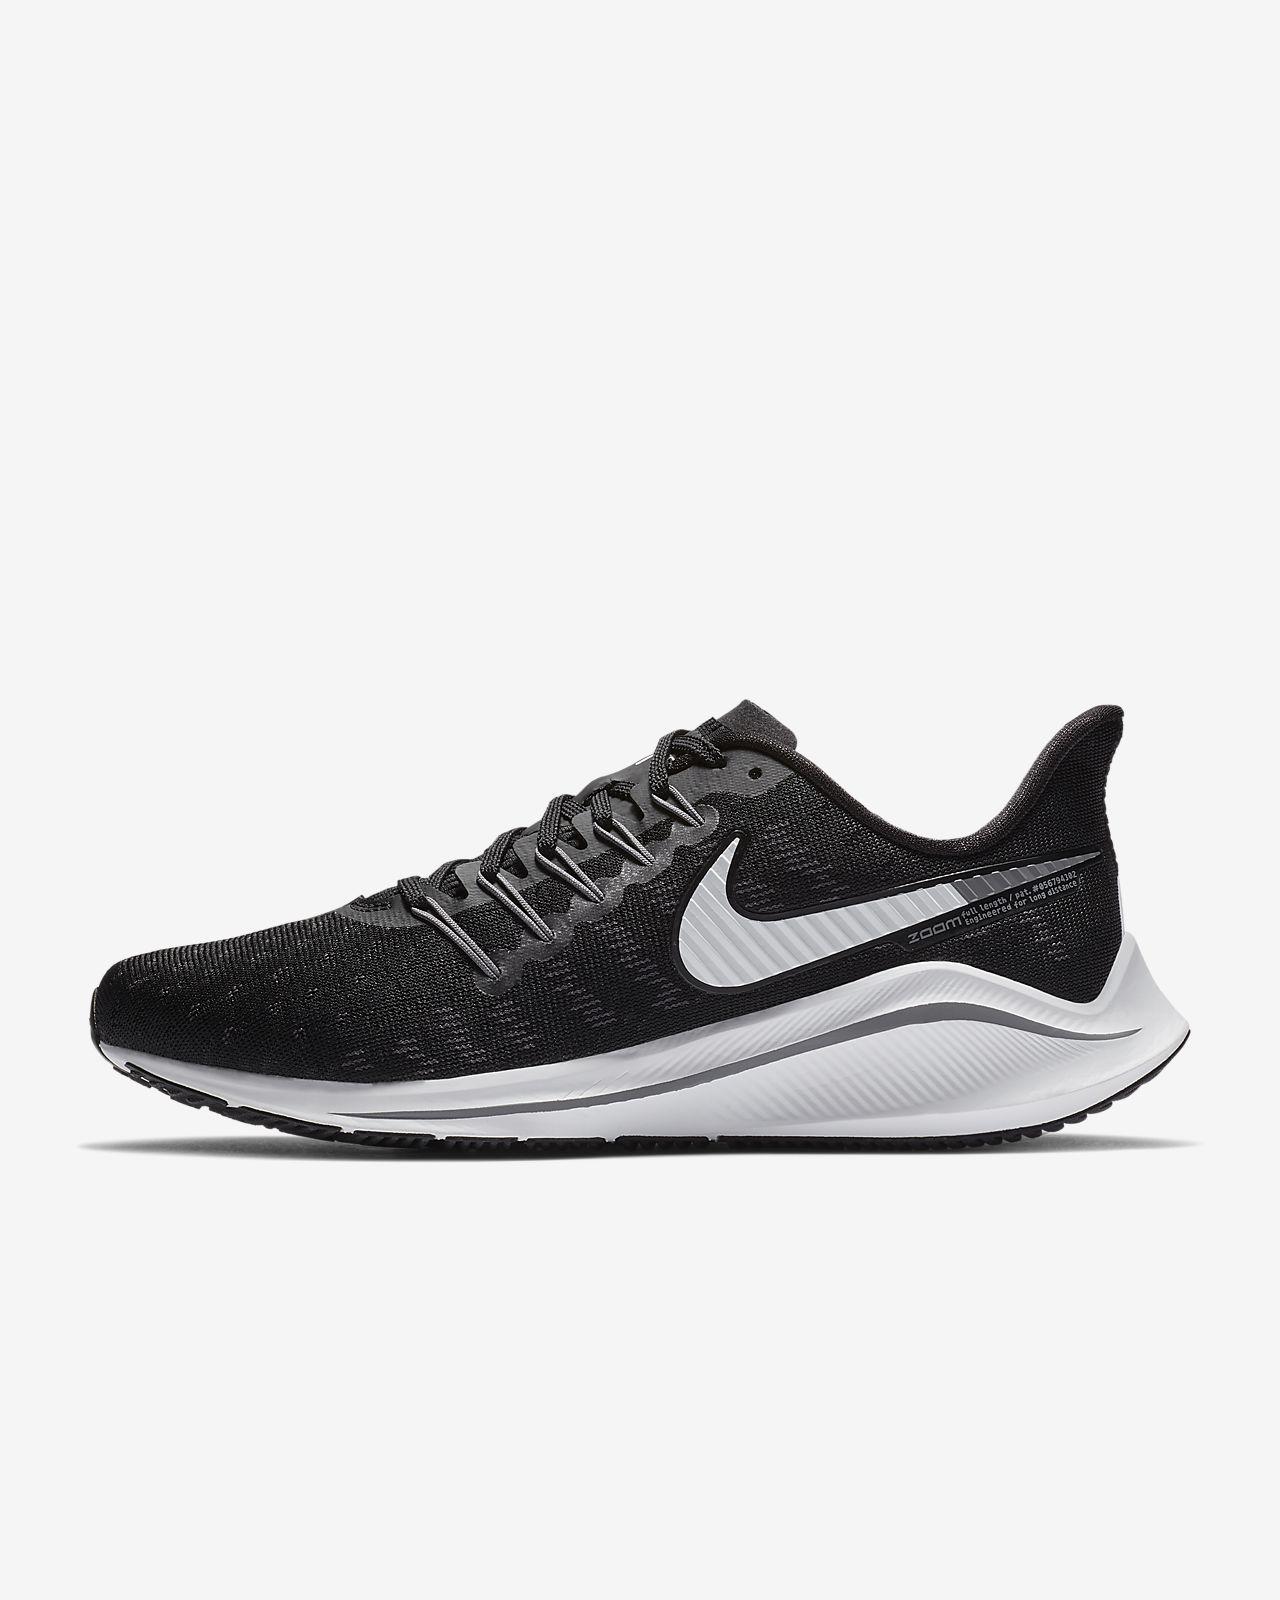 Dámská běžecká bota Nike Air Zoom Vomero 14 (širší provedení)